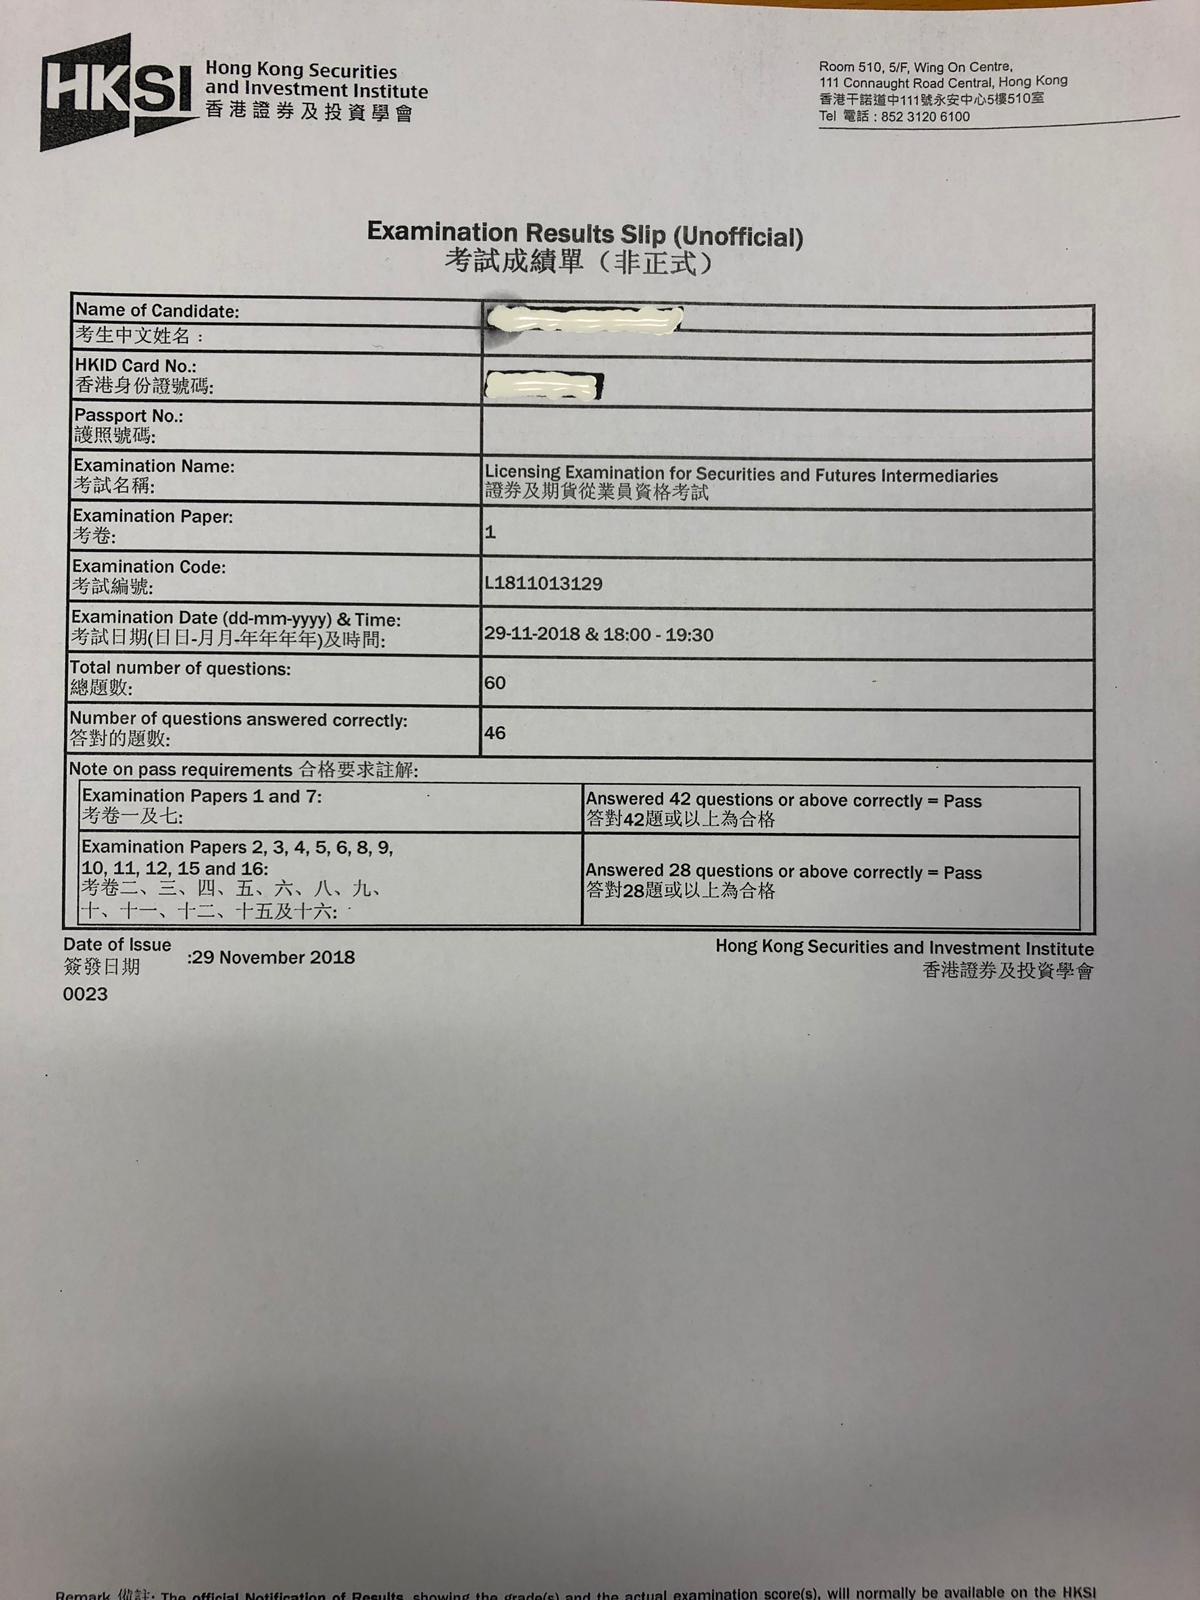 WYEP 29/11/2018 LE Paper 1 證券期貨從業員資格考試卷一 Pass